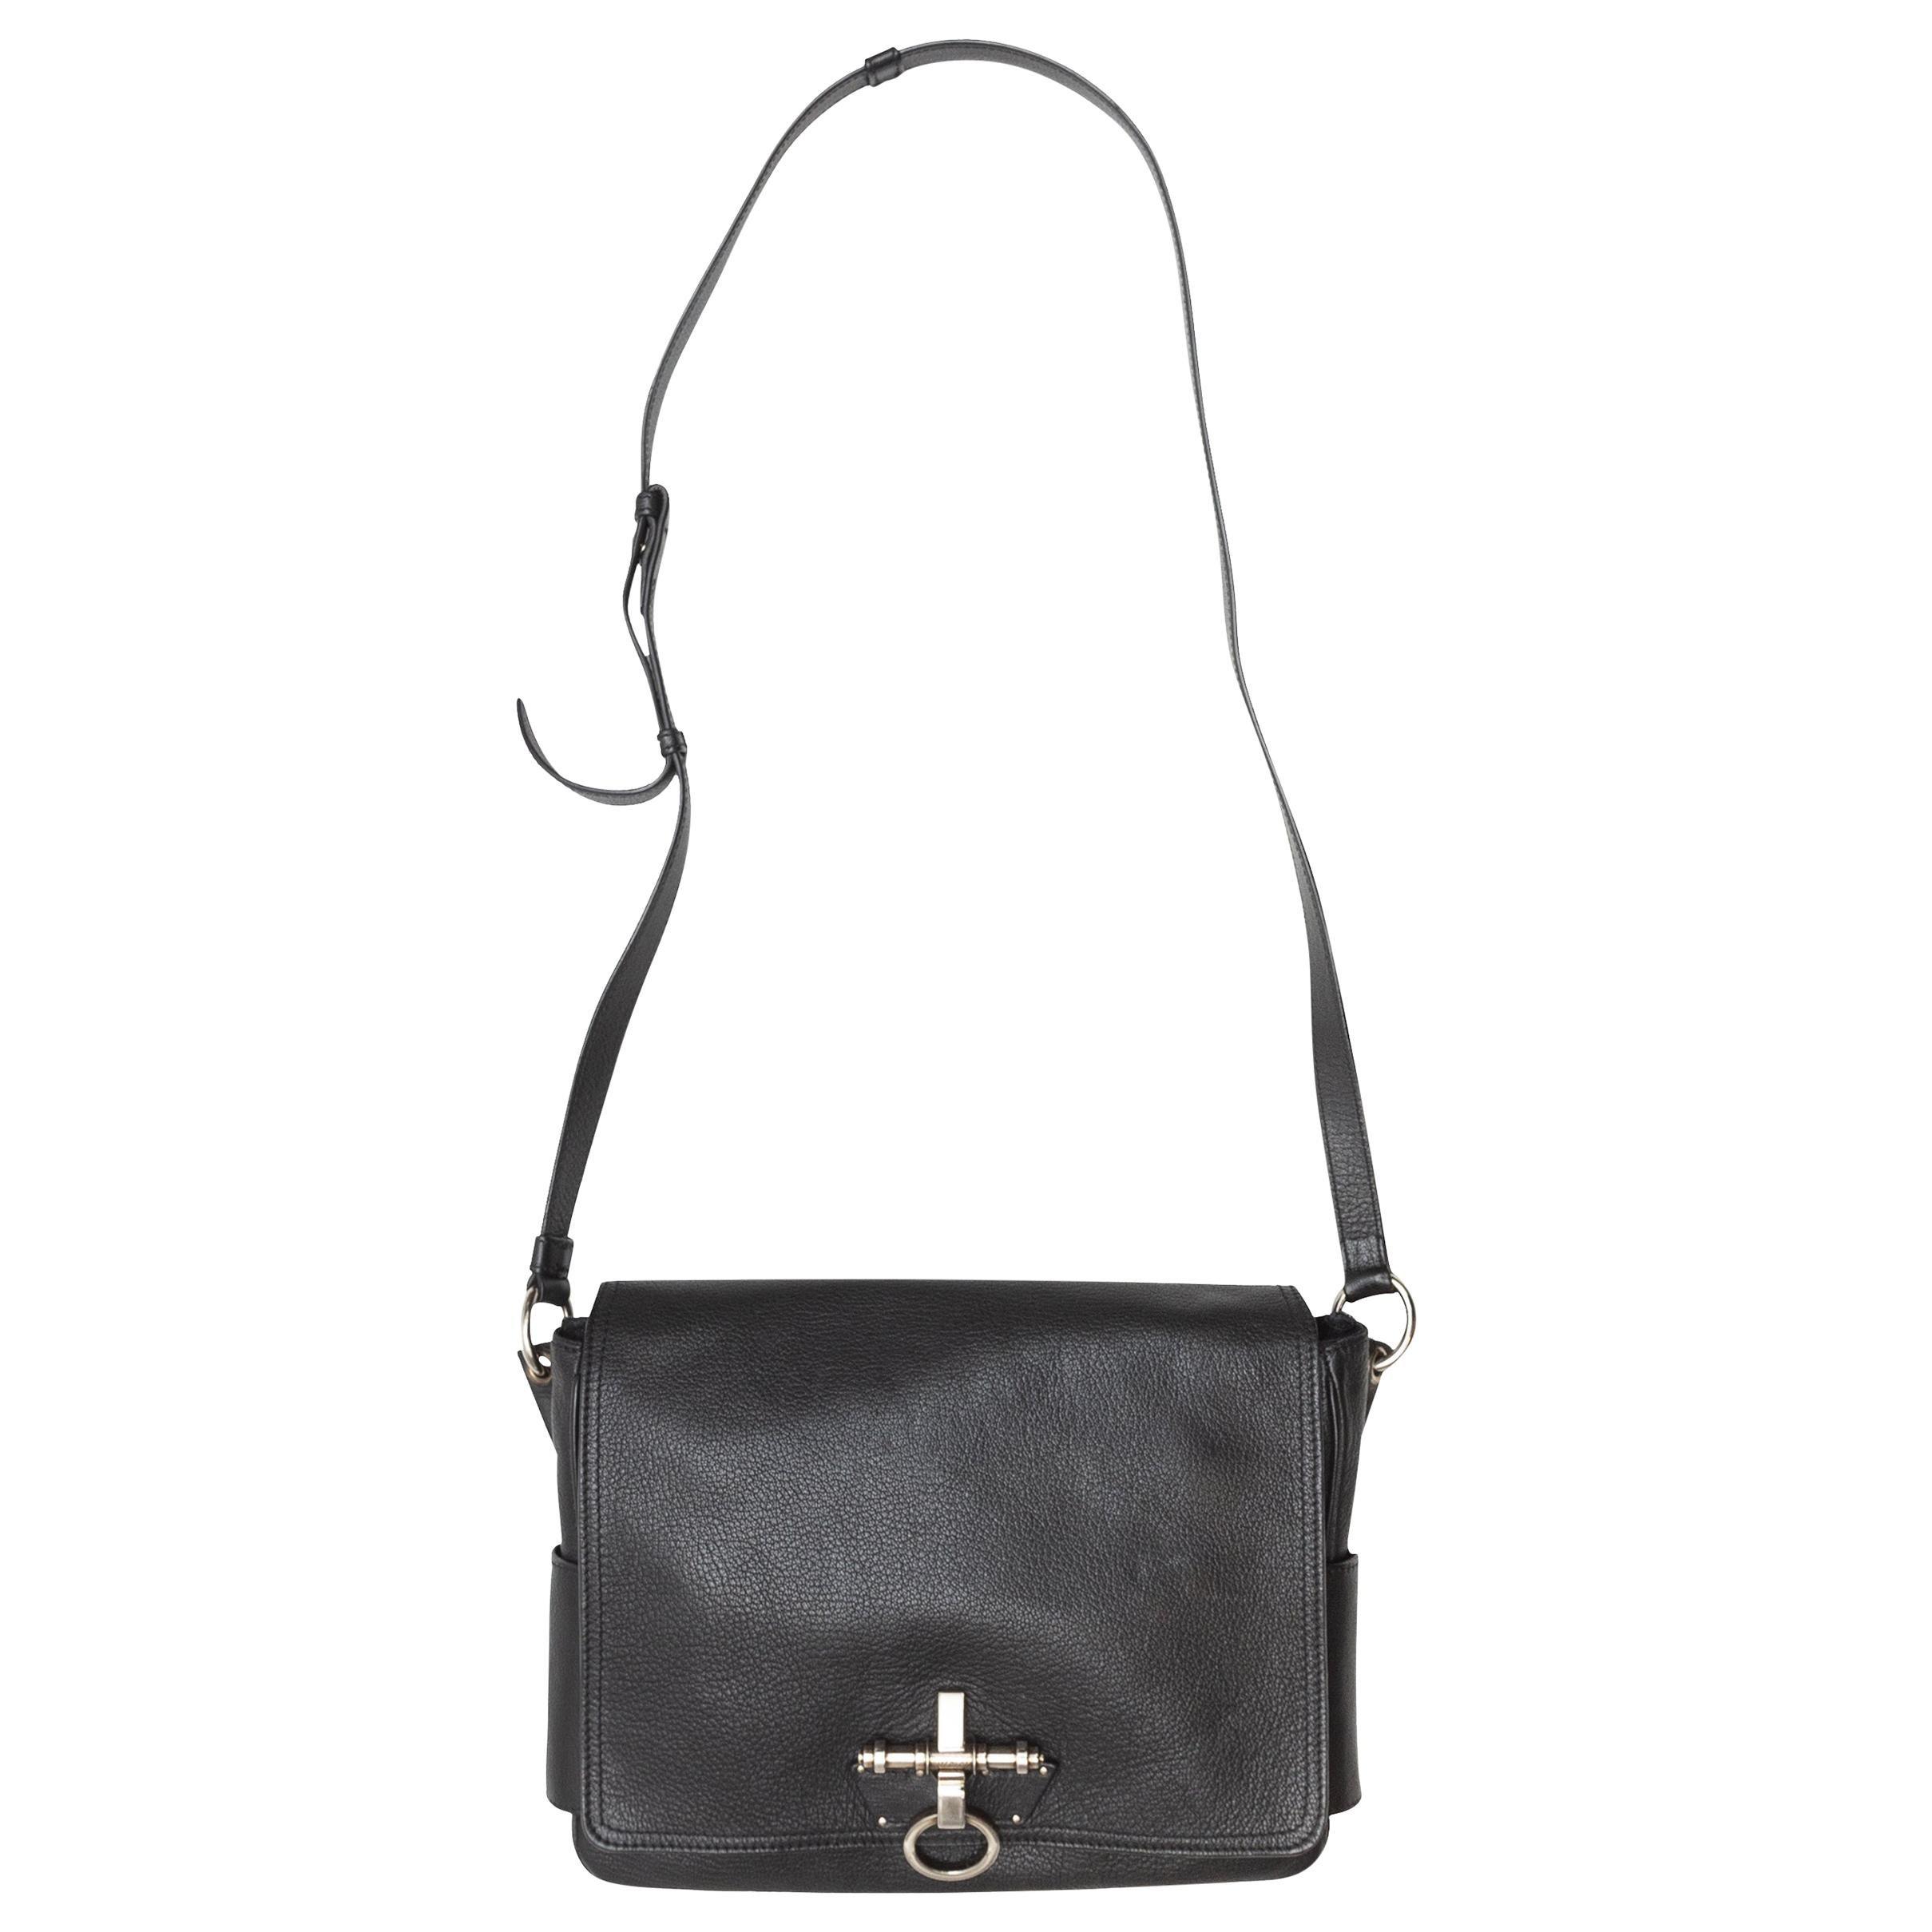 Givenchy Black Soft Leather Obsedia Crossbody Bag